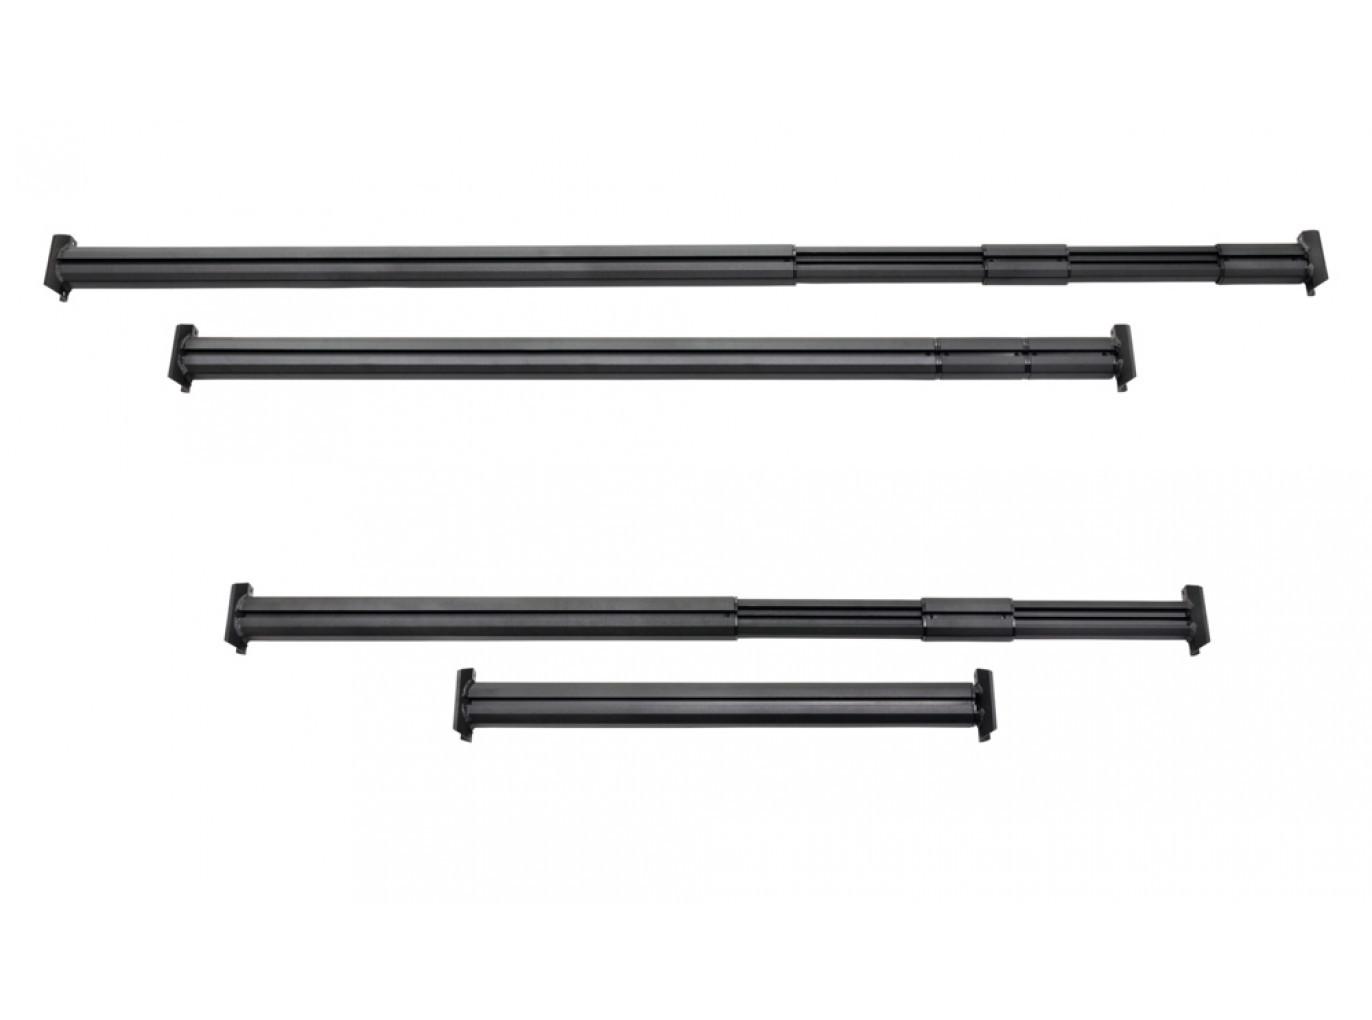 SideBar - Long Bed